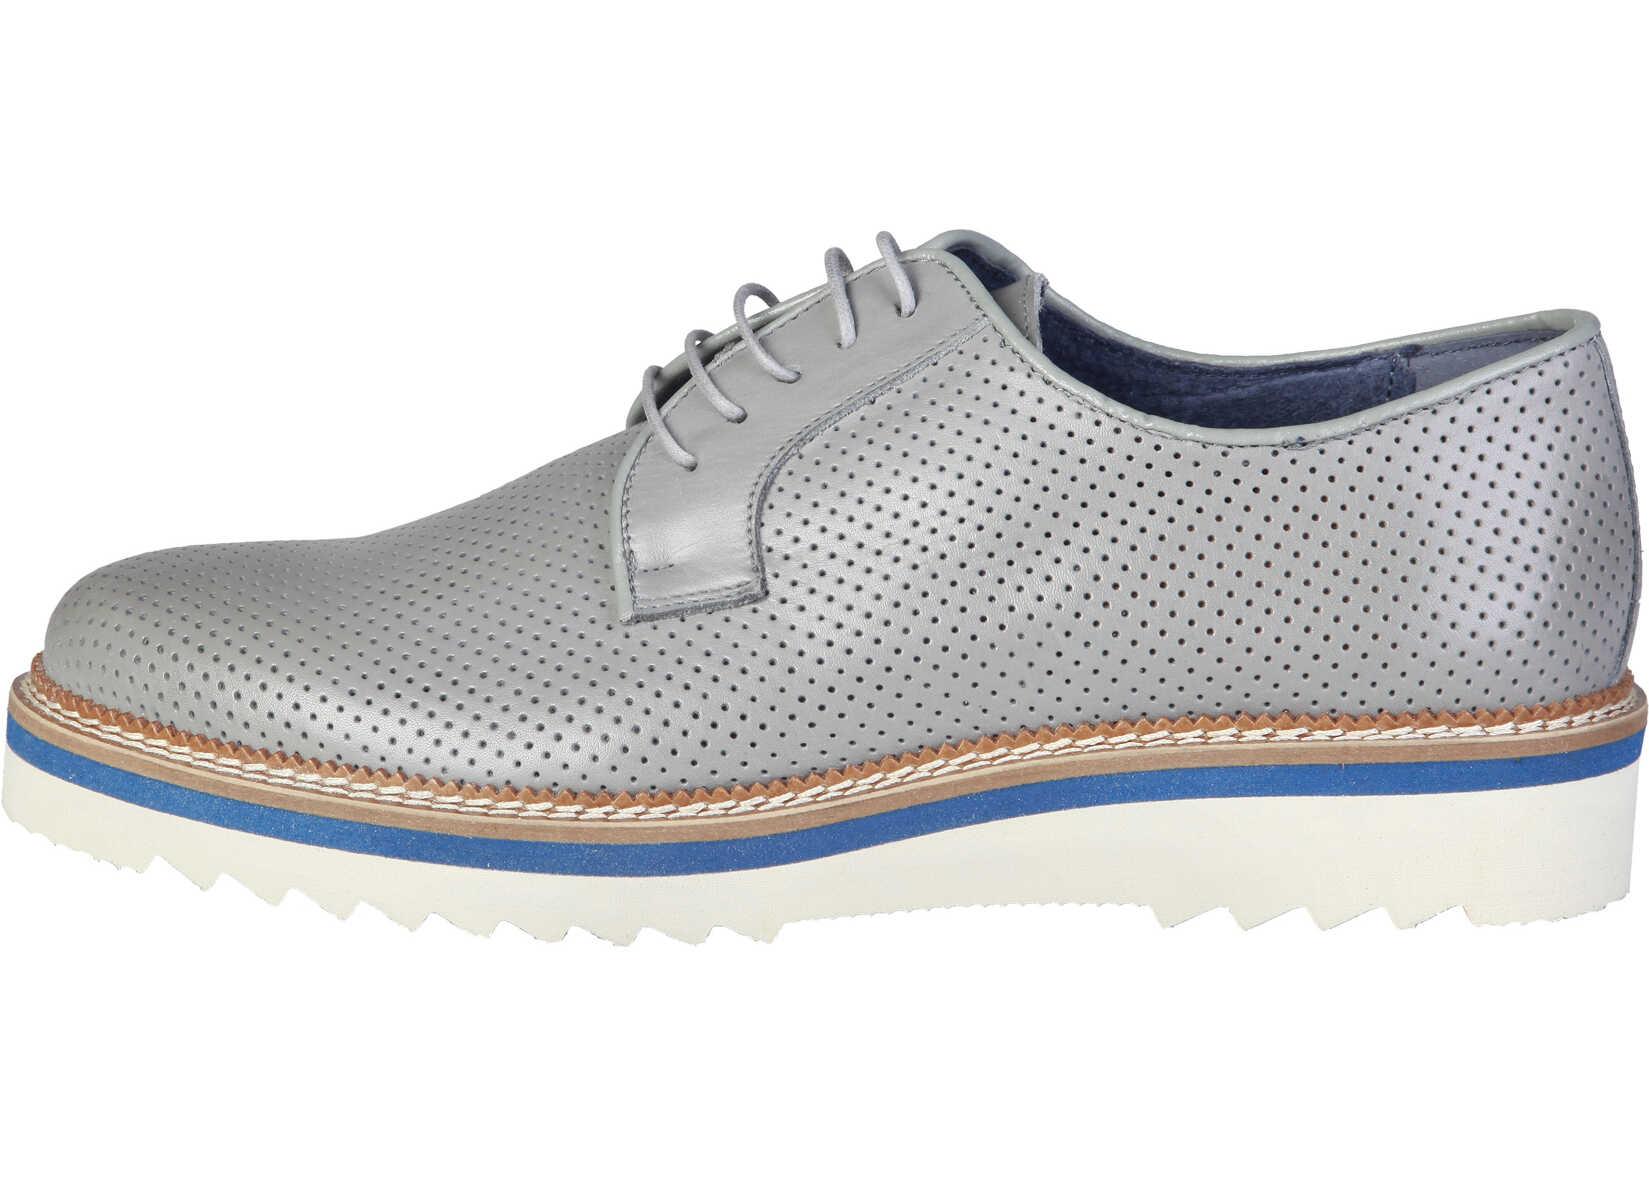 Pantofi Barbati Pierre Cardin Cm-6011 Grey